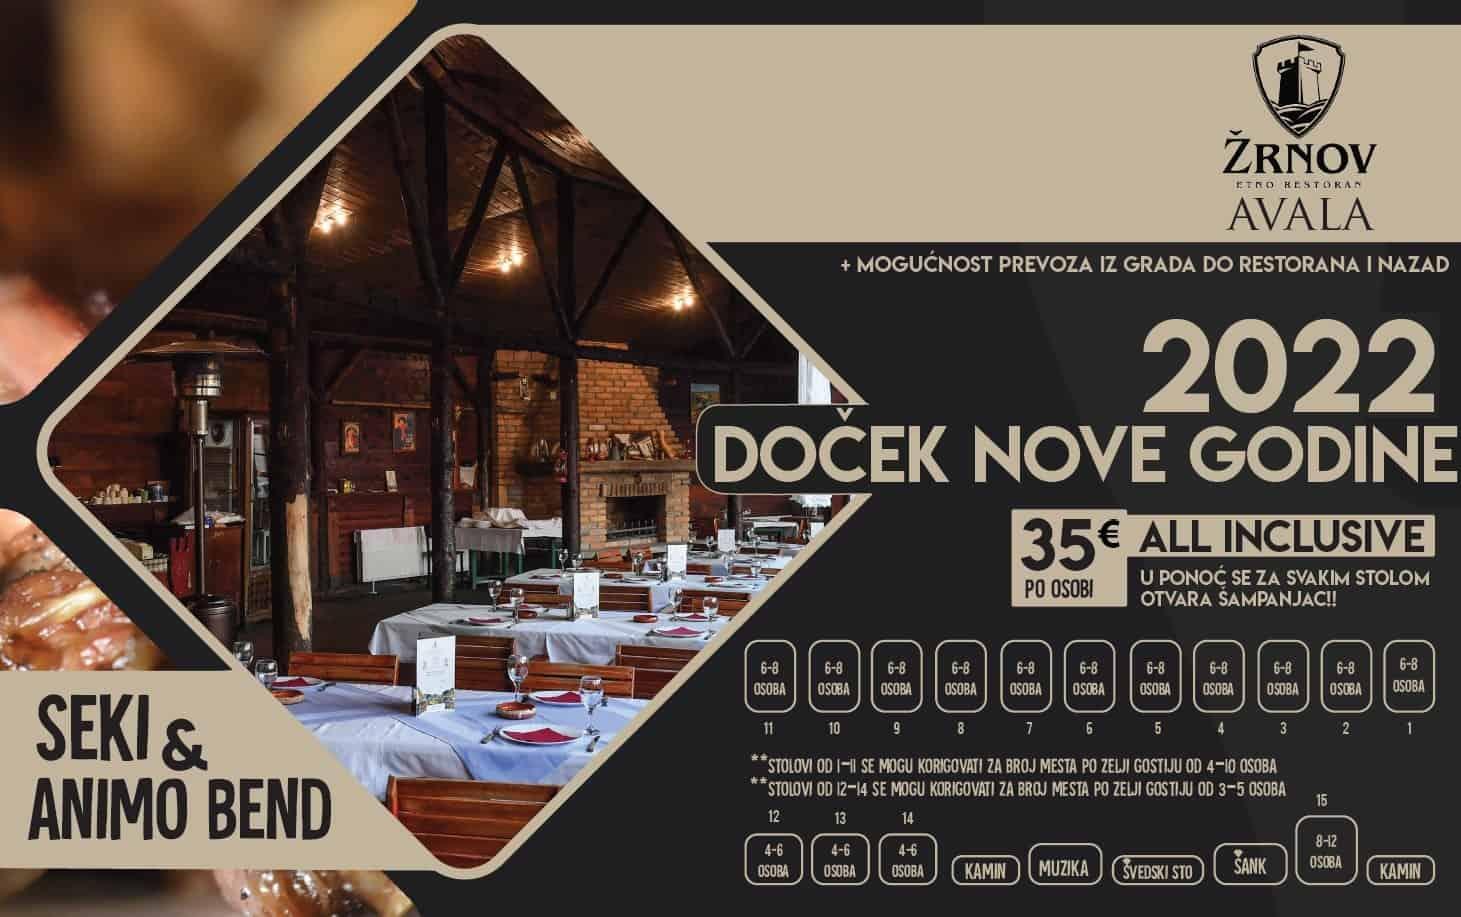 Etno restoran Žrnov Avala mapa sa rasporedom stolova za doček Nove godine 2022 Beograd